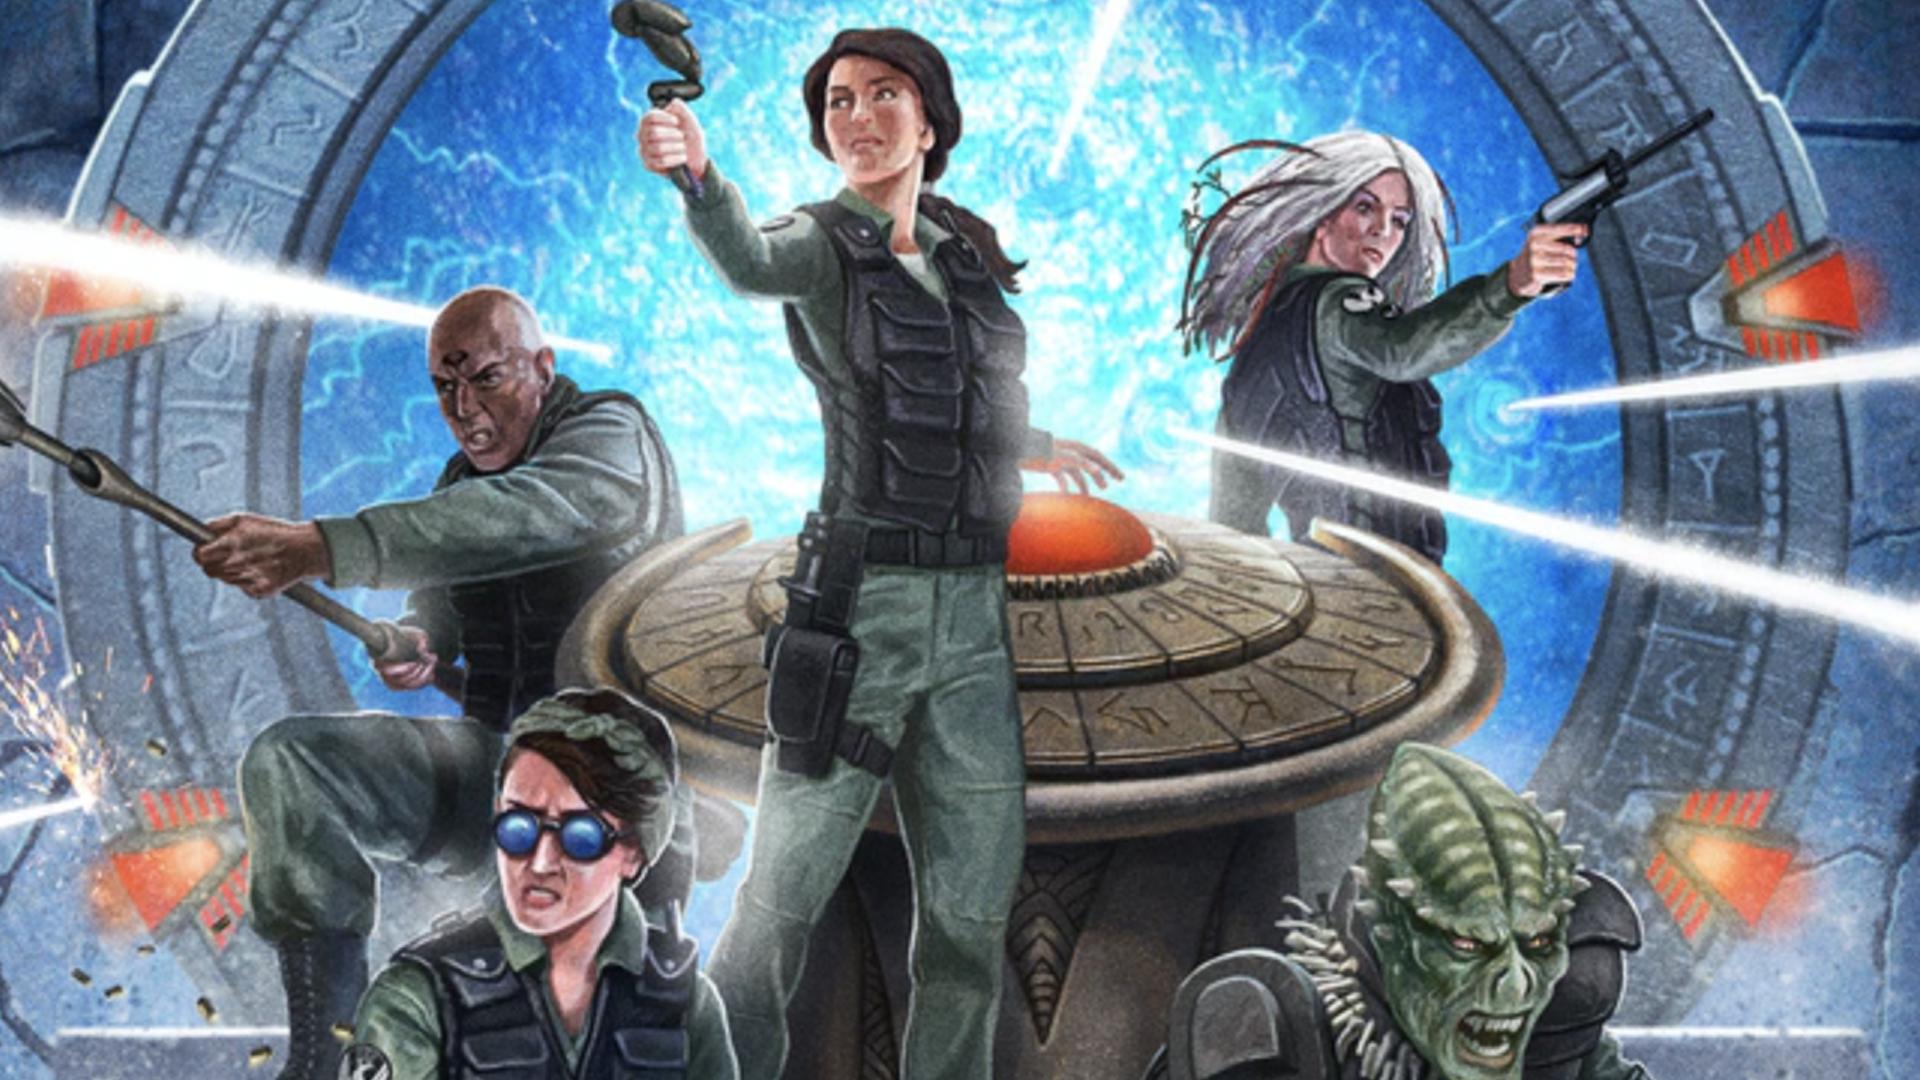 Stargate SG-1: Roleplaying Game artwork